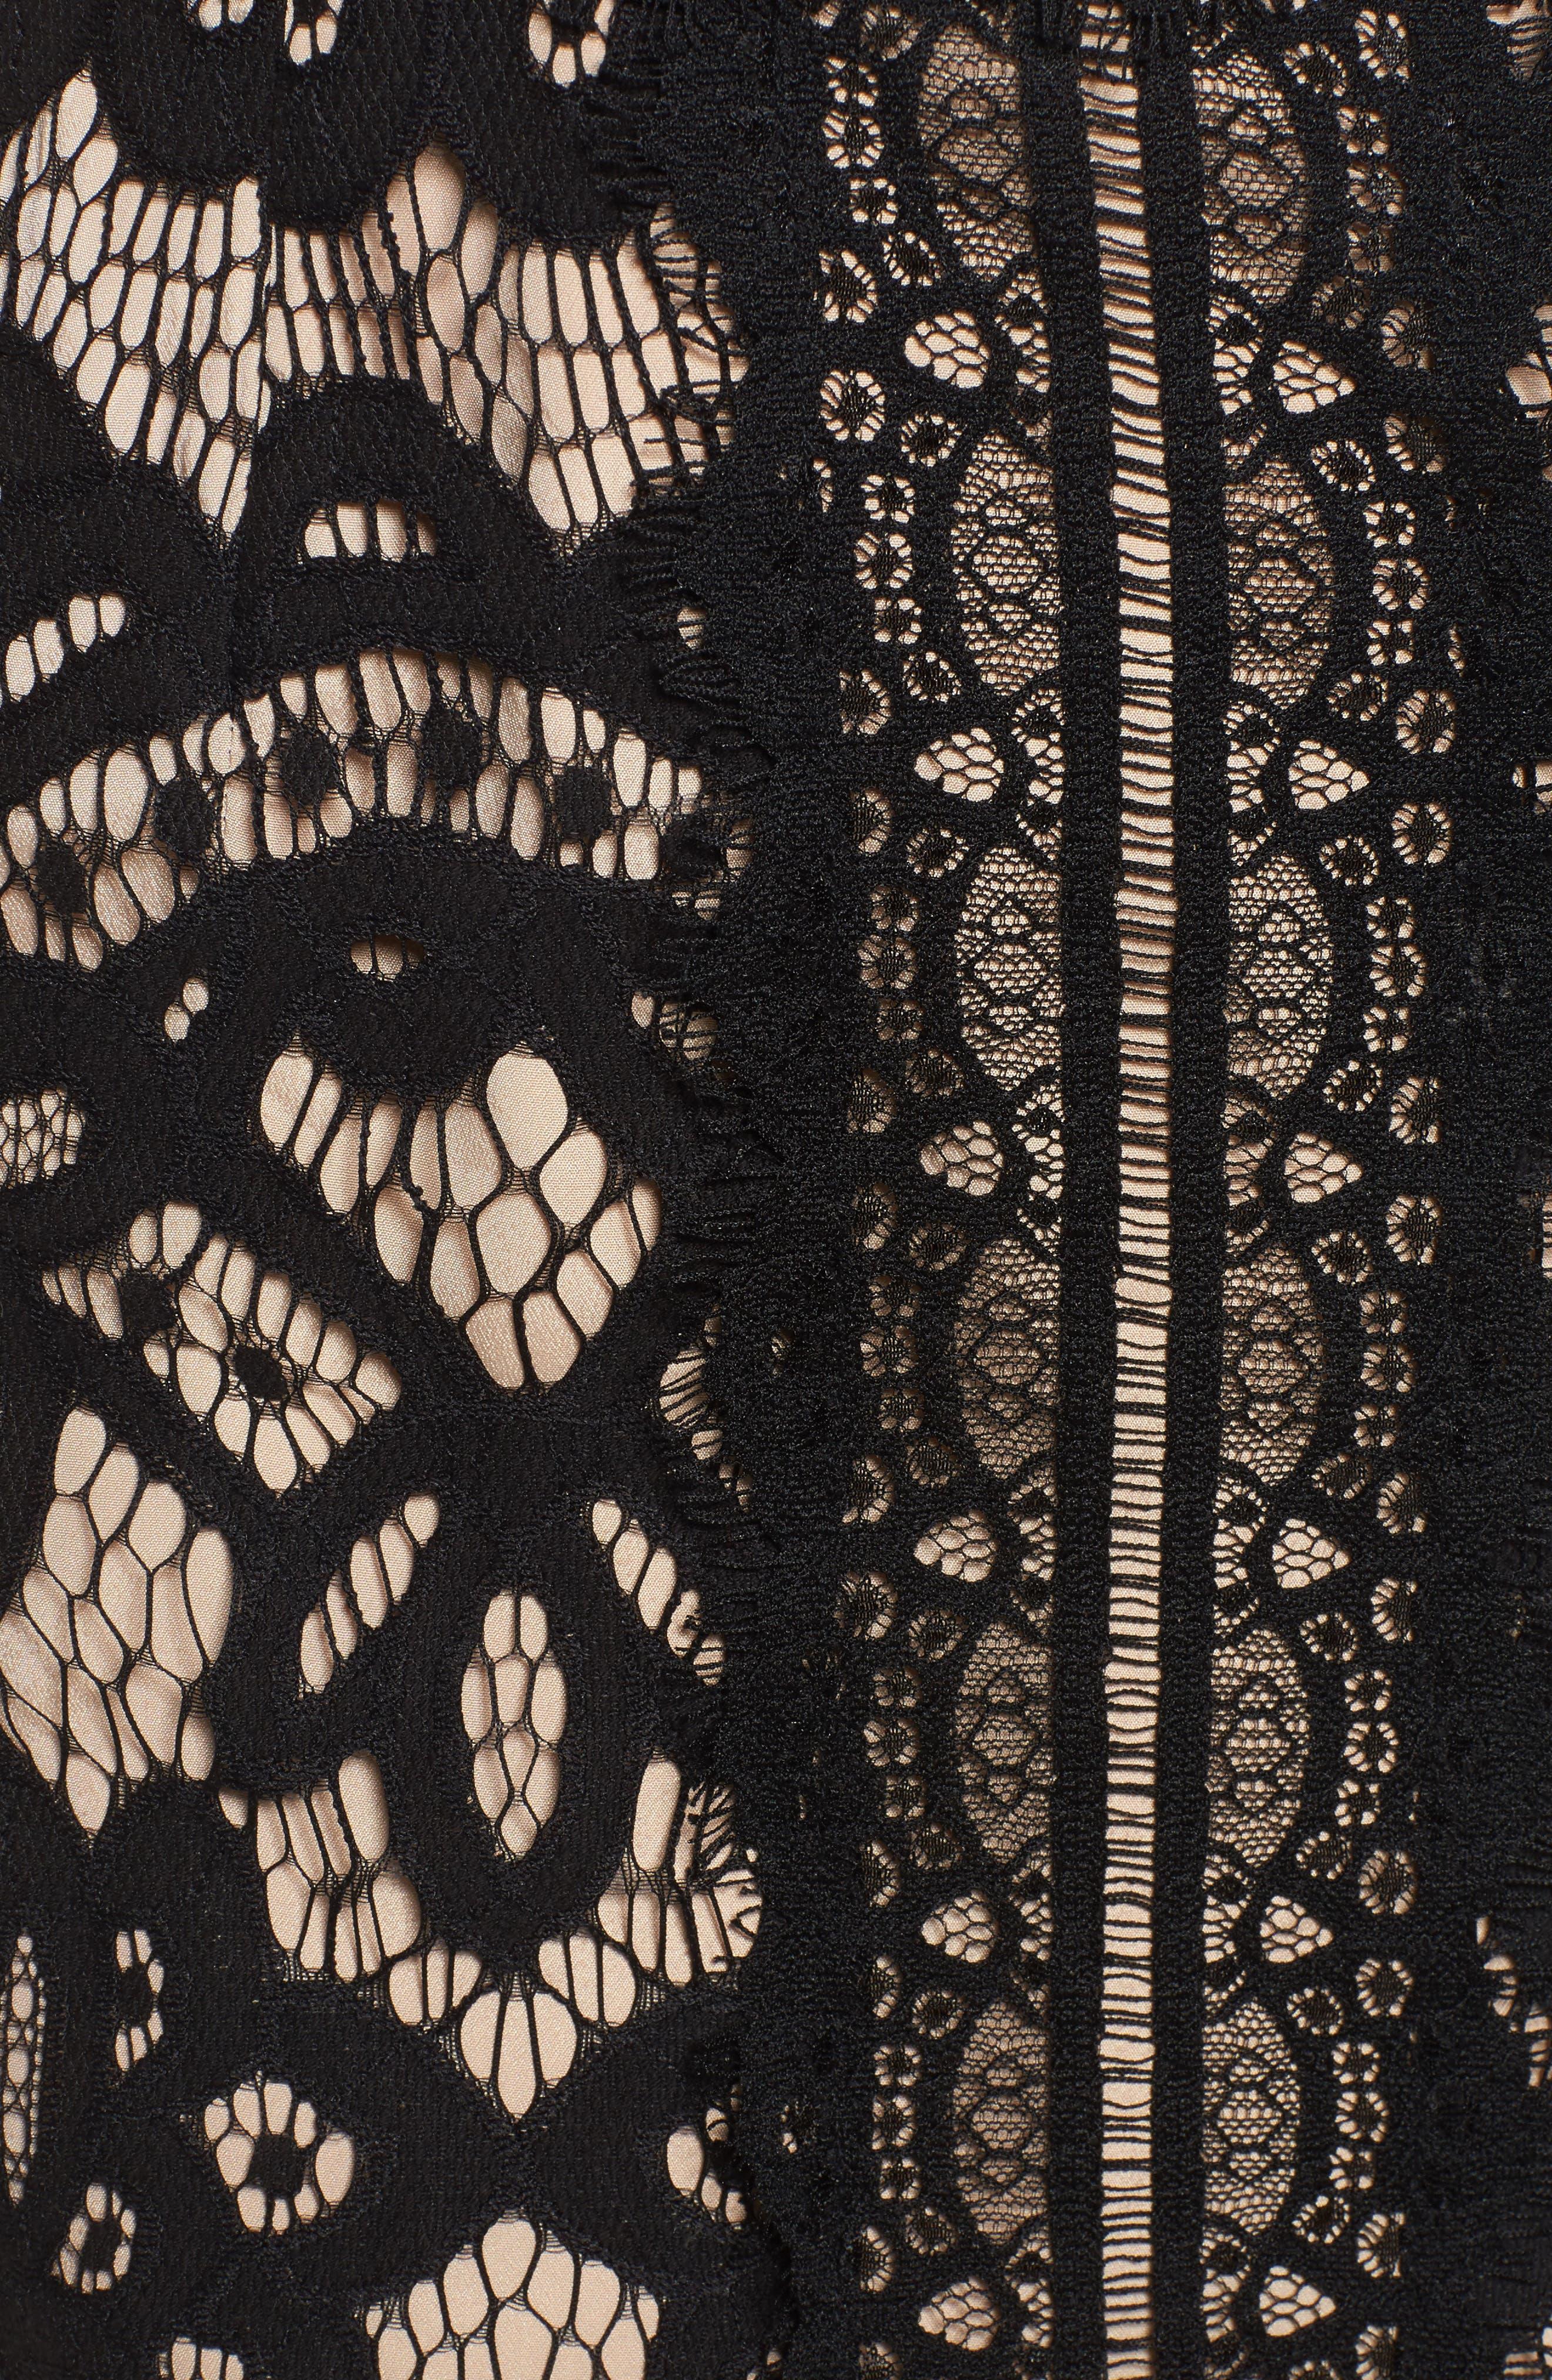 Bridges Lace Midi Dress,                             Alternate thumbnail 5, color,                             001